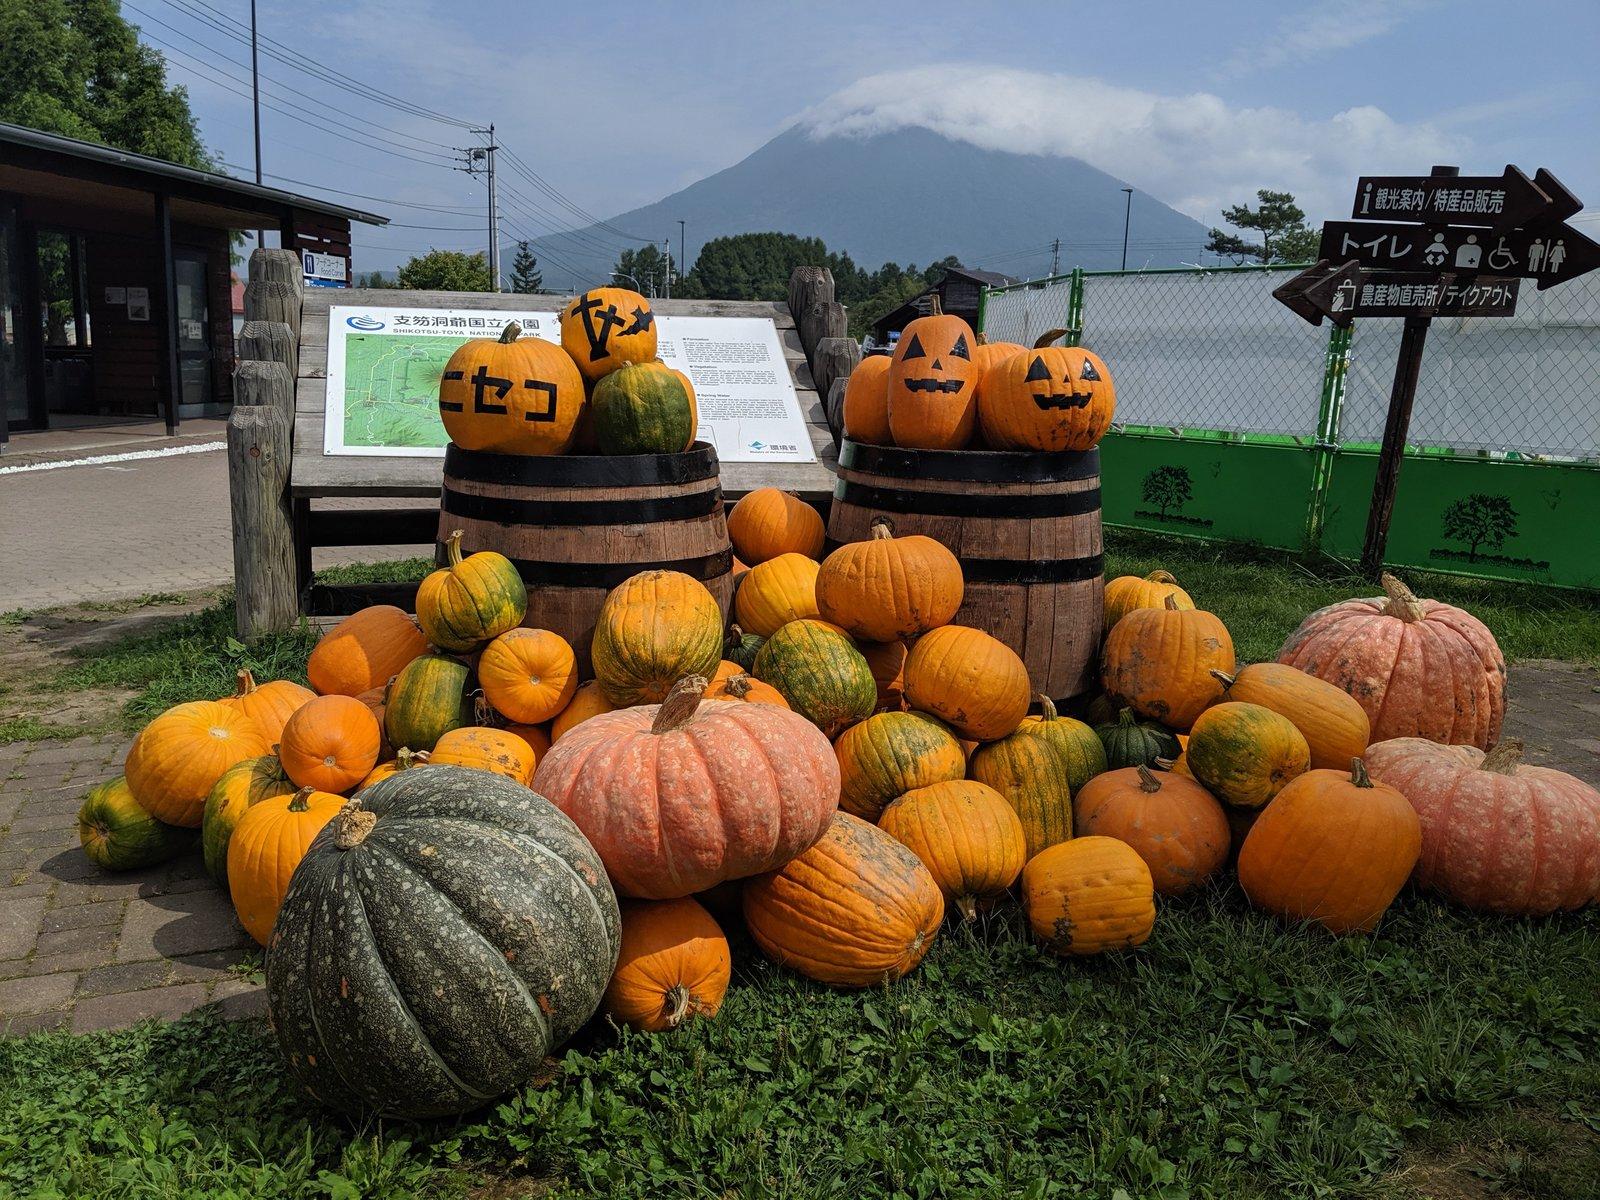 niseko view plaza market fresh vegetables produce